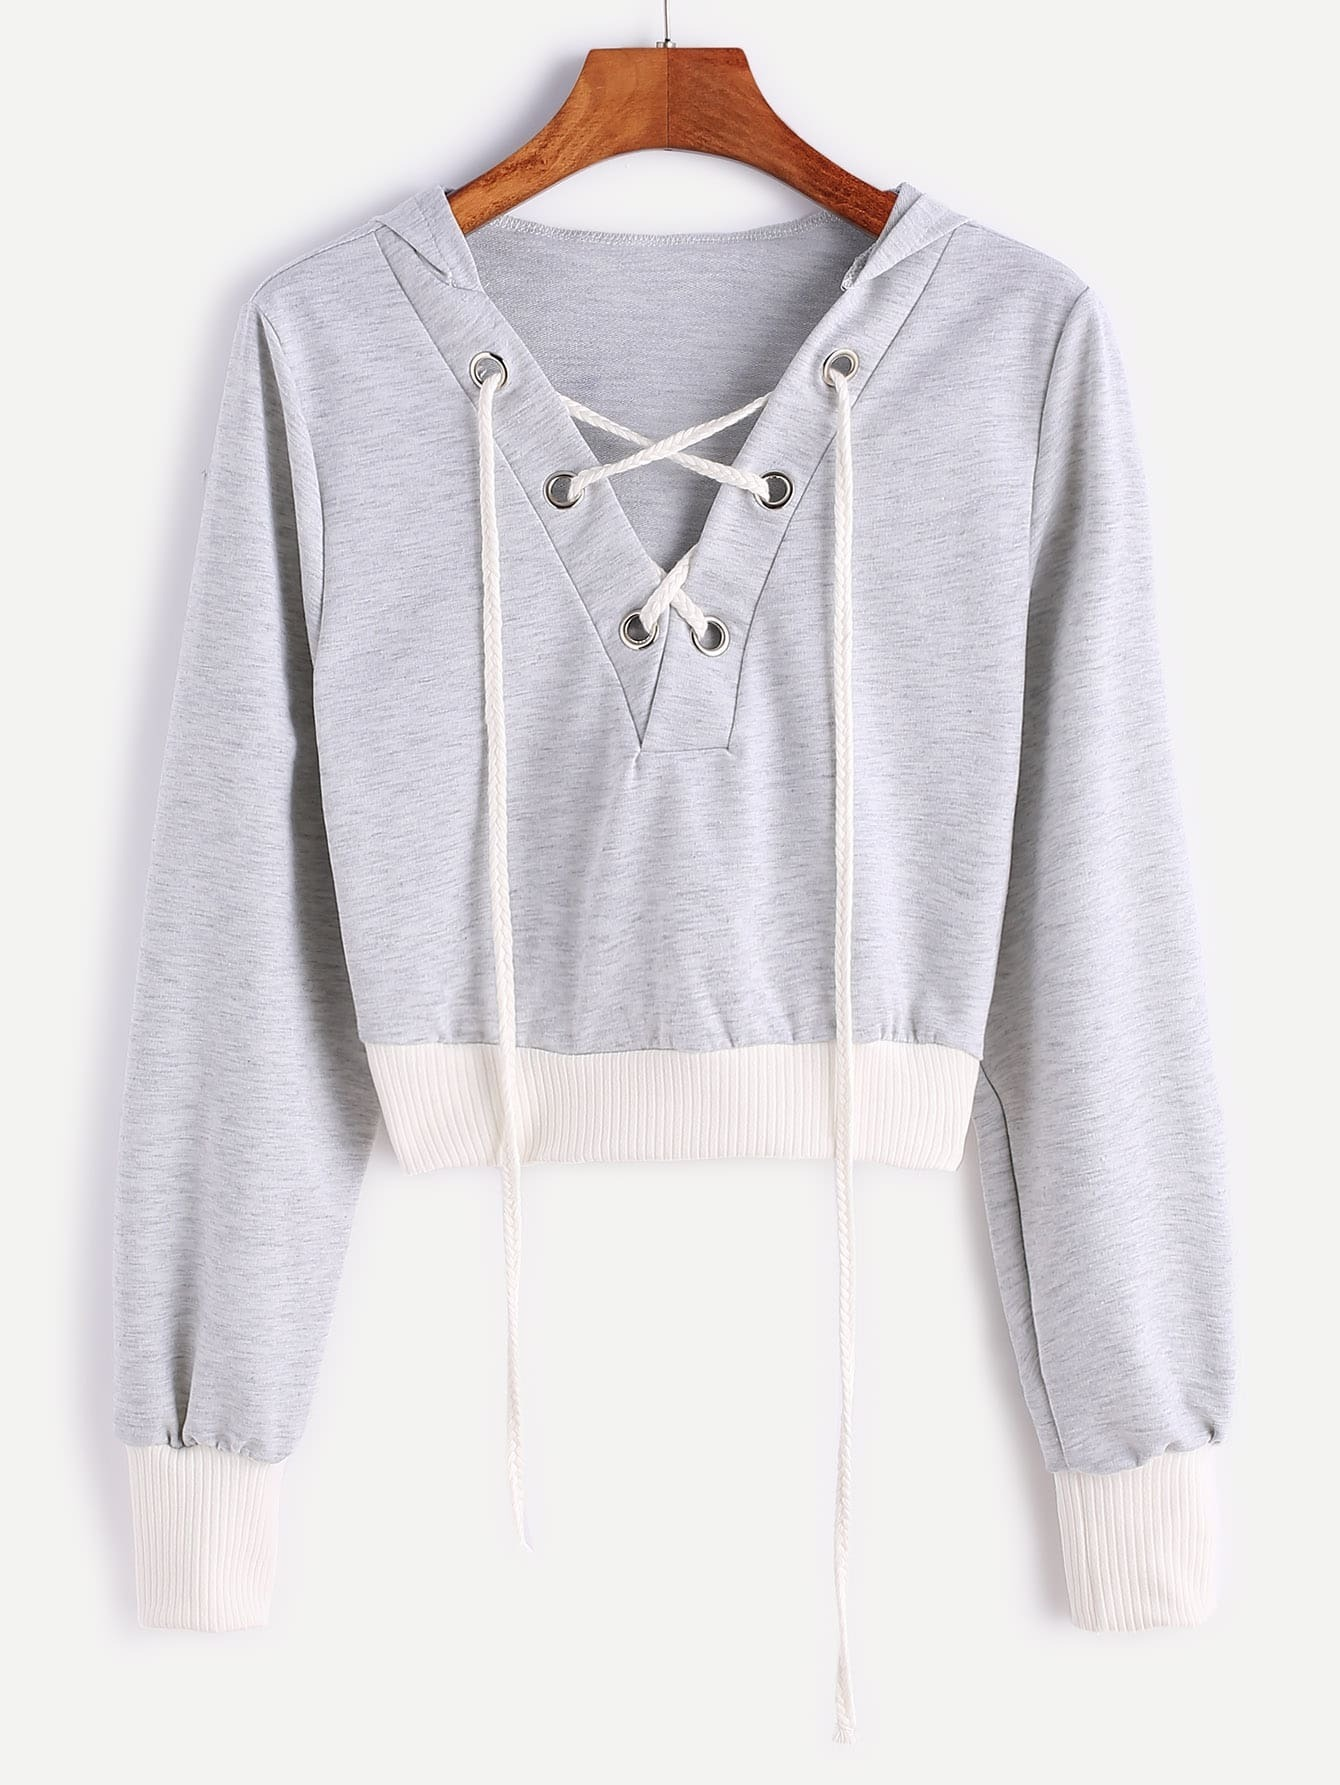 Contrast Ribbed Trim Hooded Lace Up Crop Sweatshirt sweatshirt161128303